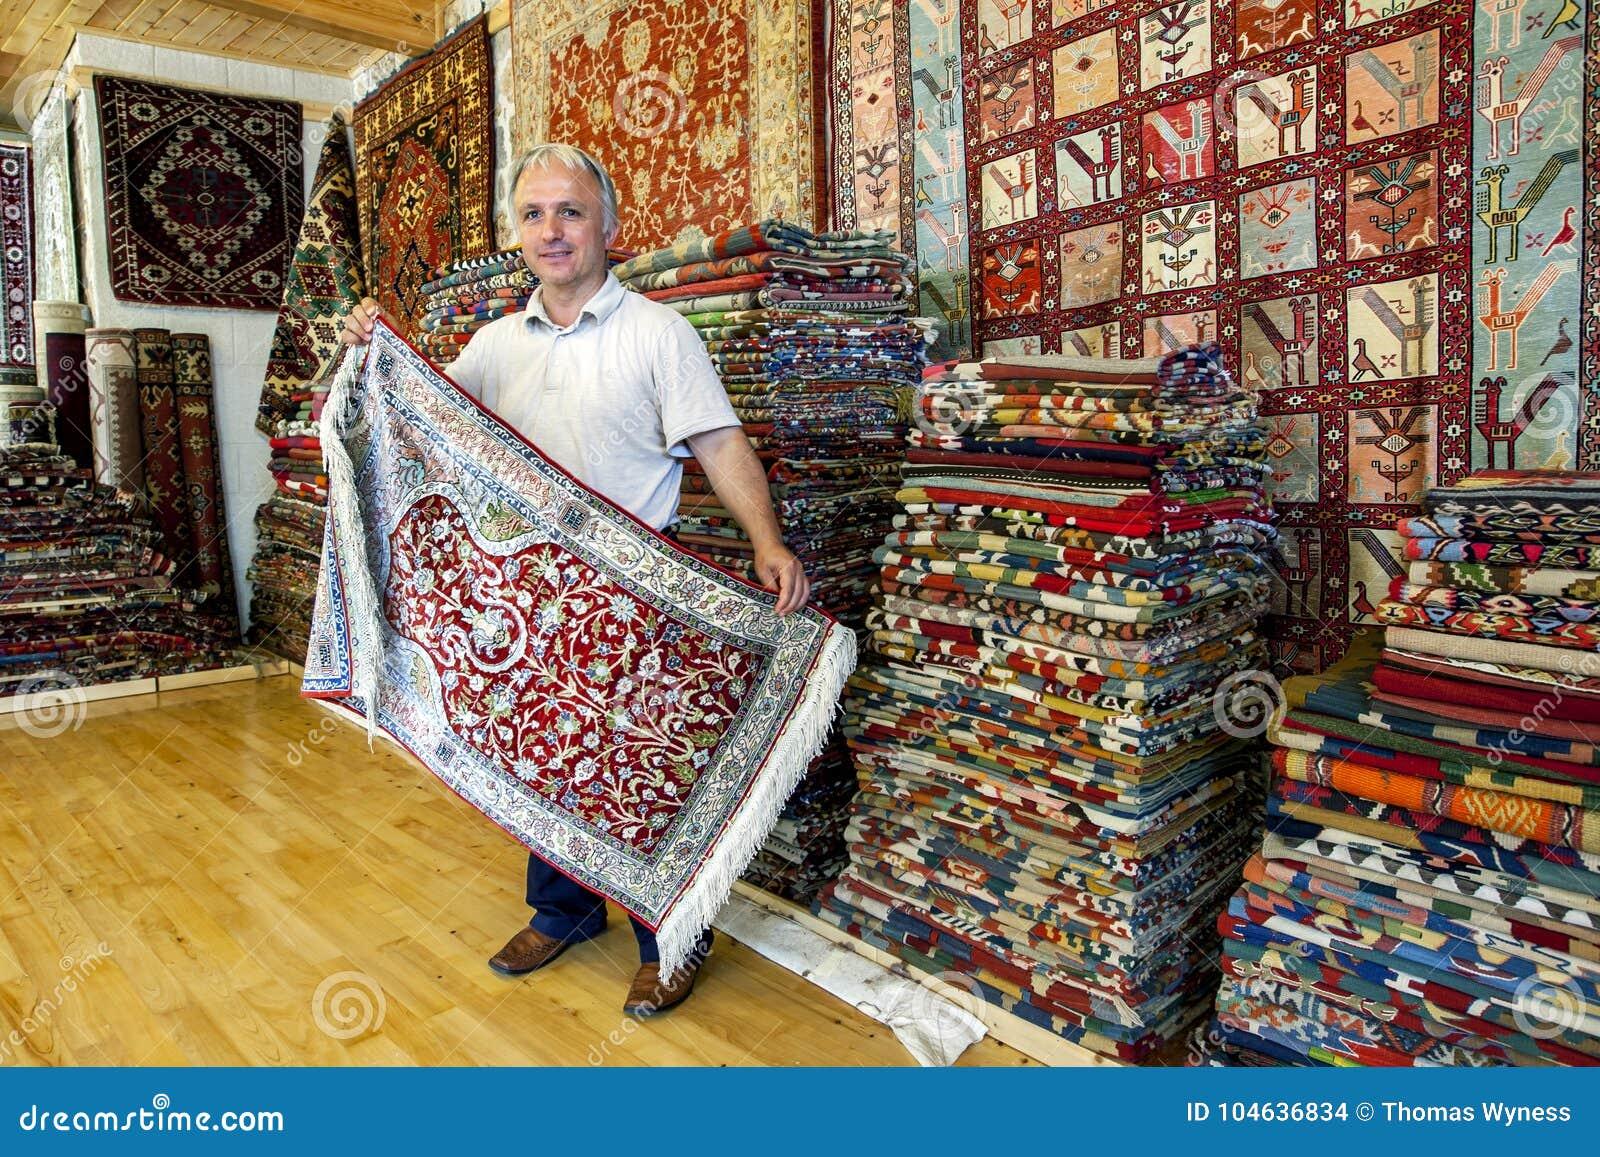 A Turkish Carpet Seller Displays Rug In Shop The Old Town Of Kaleici